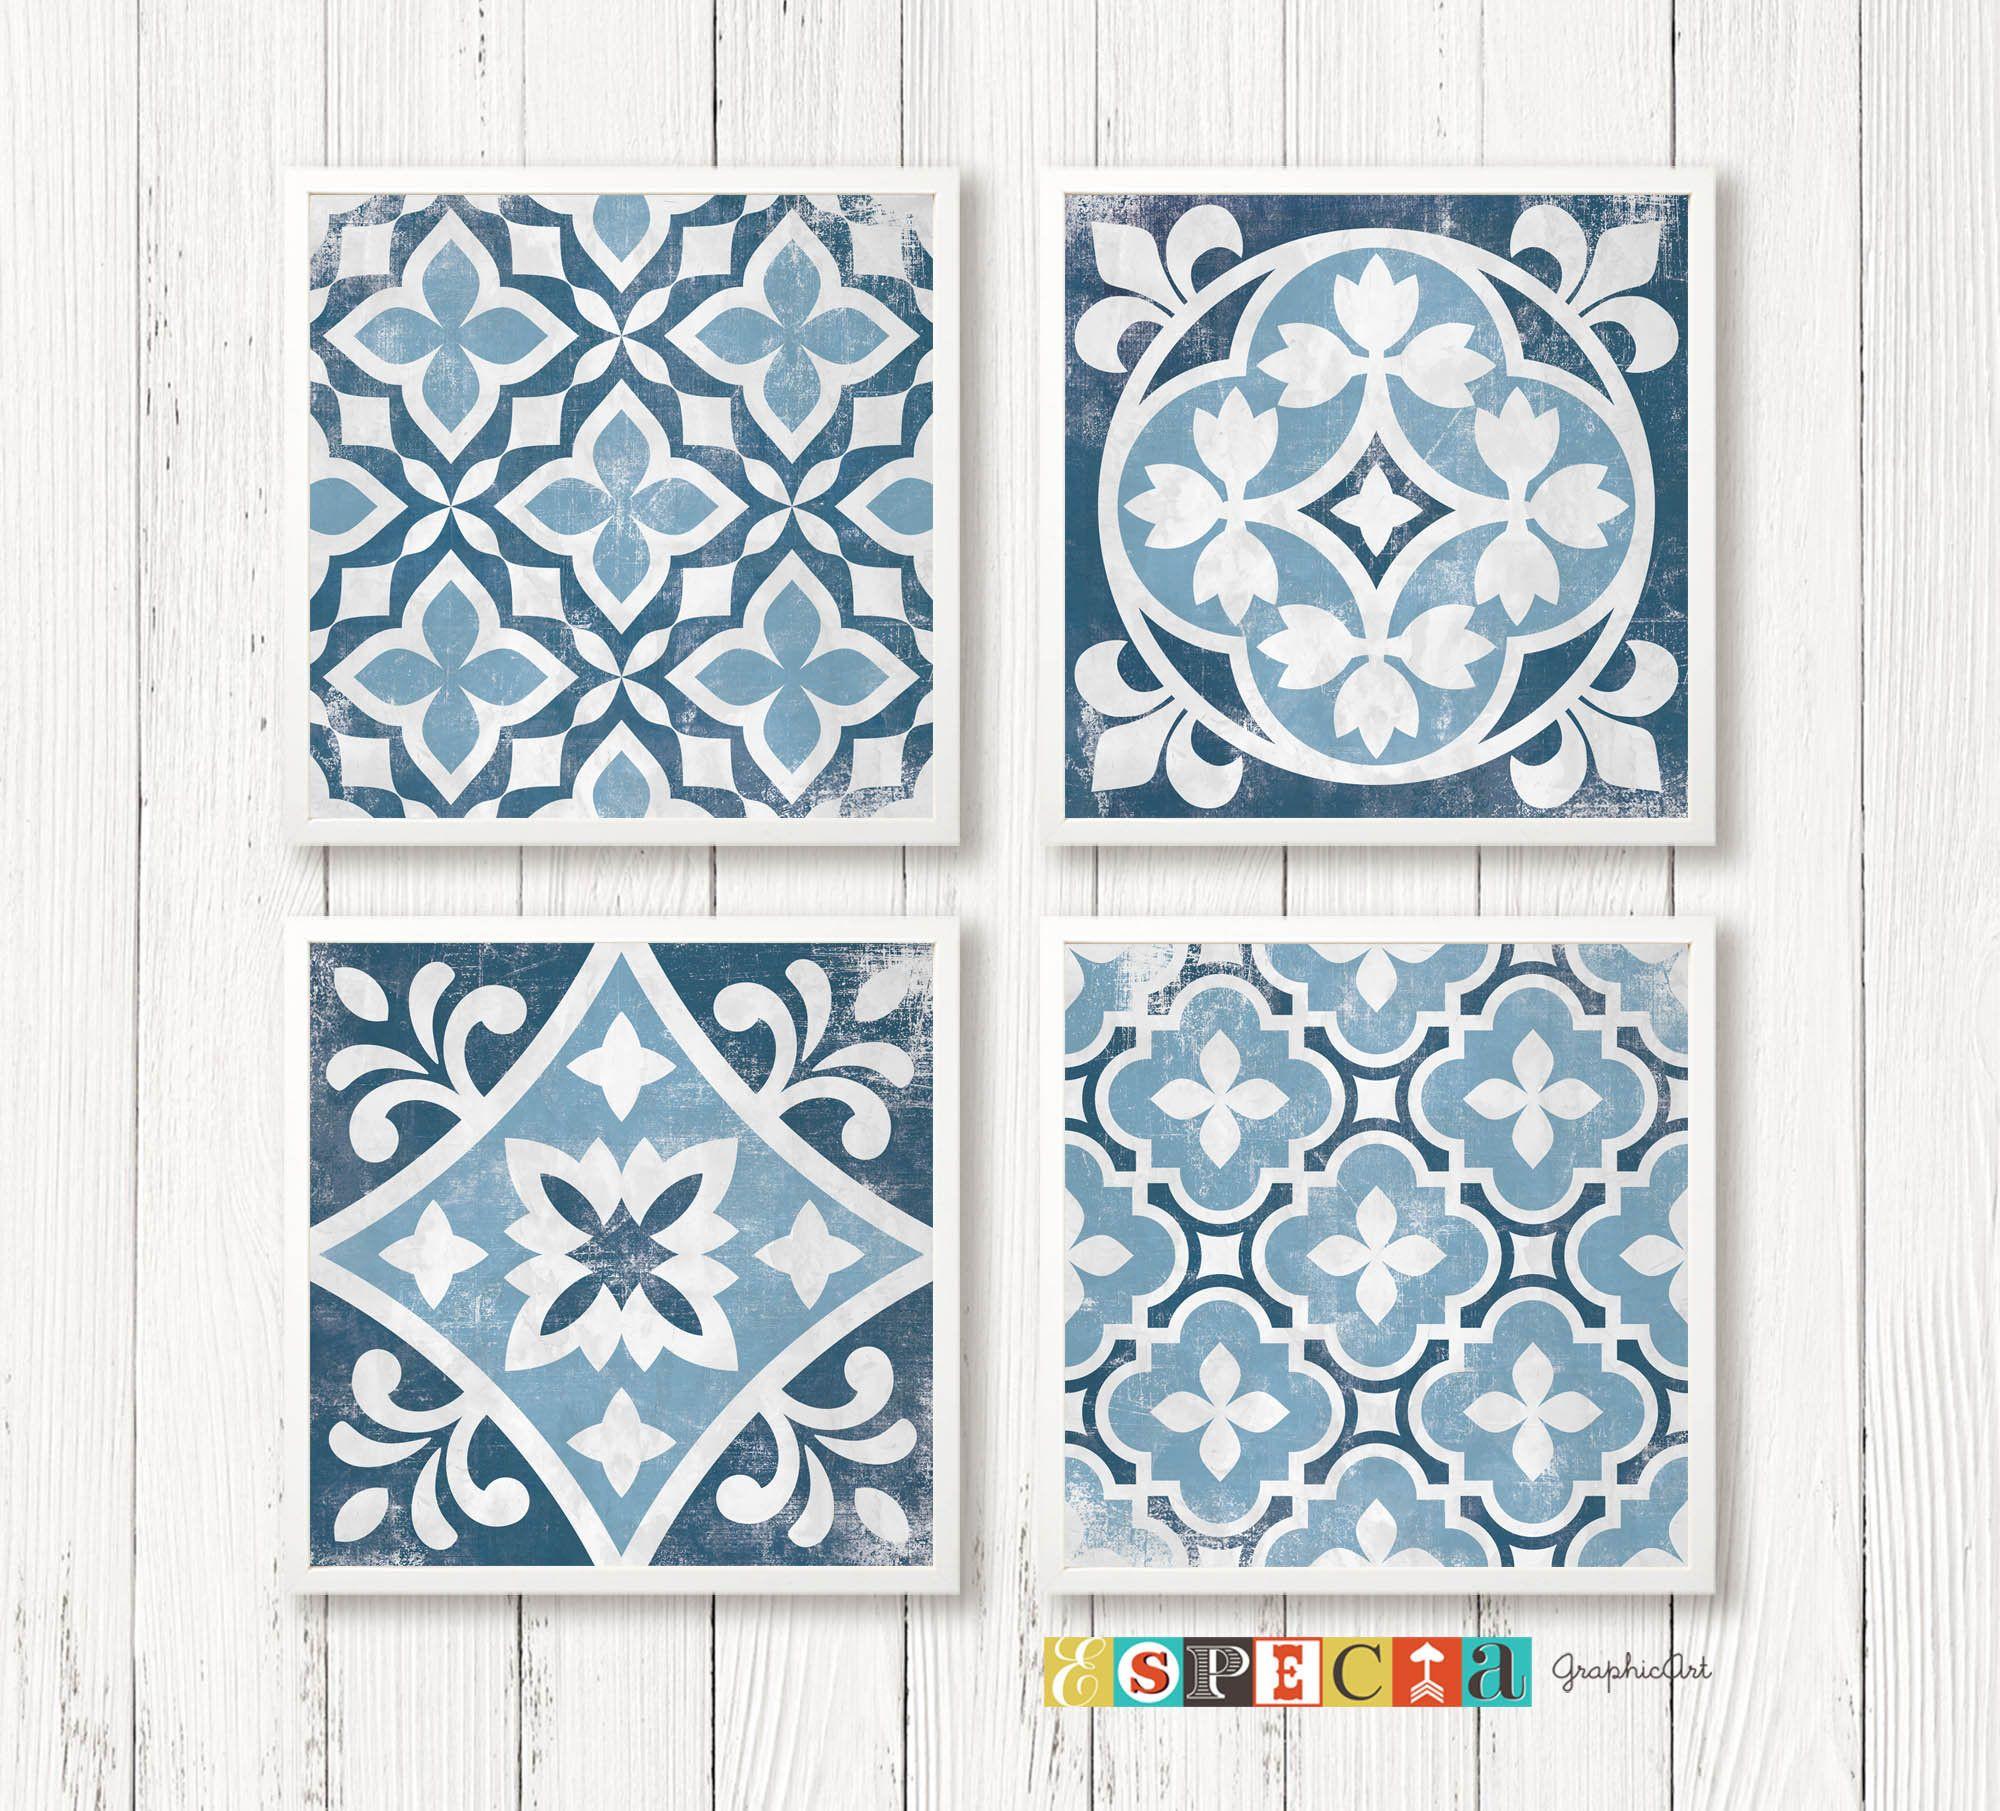 Tiles Design Geometric Tile Art Printable Distressed Blue Wall Decor Set Of 4 8x8 Square Posters Digital Prints Fo In 2020 Geometric Tiles Tile Art Blue Wall Decor